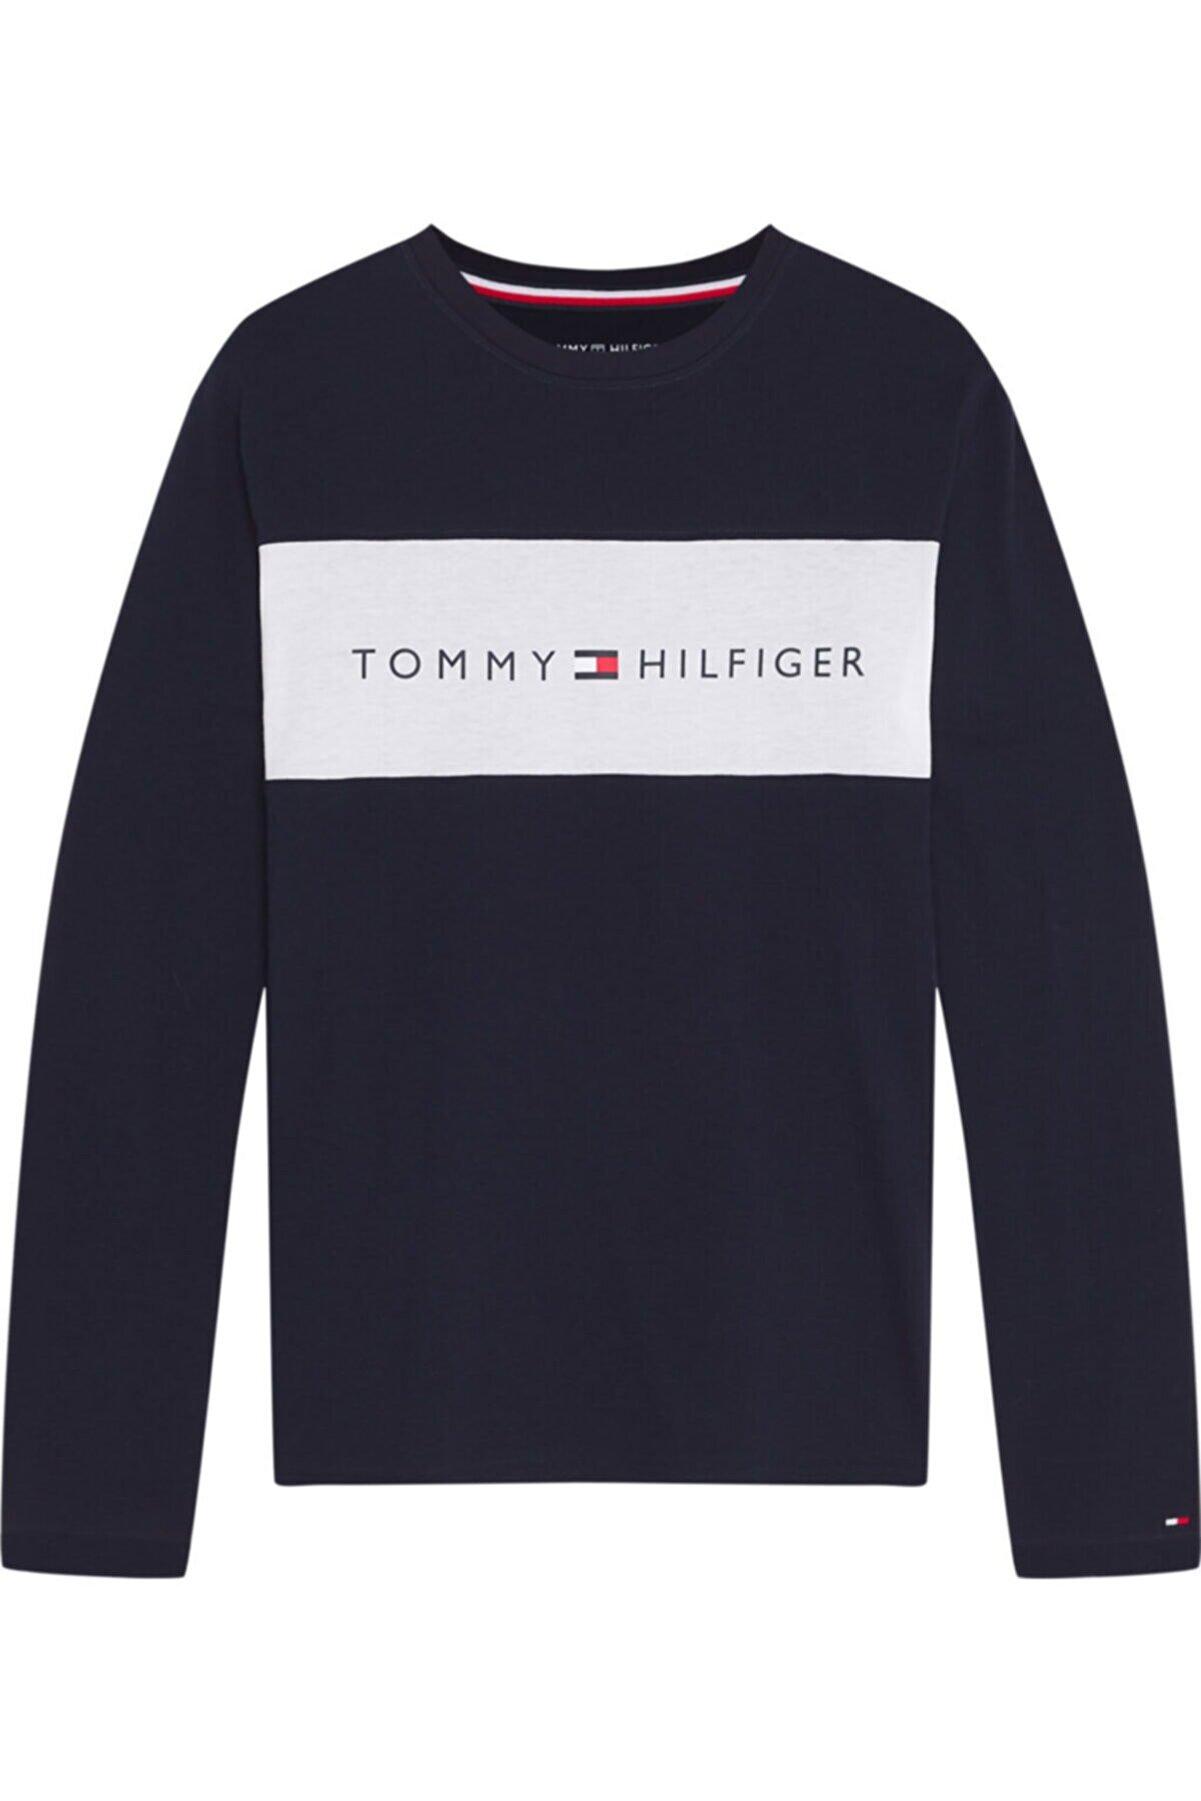 Tommy Hilfiger Th Erkek Cn Logo Flag Uzun Kollu T-shirt